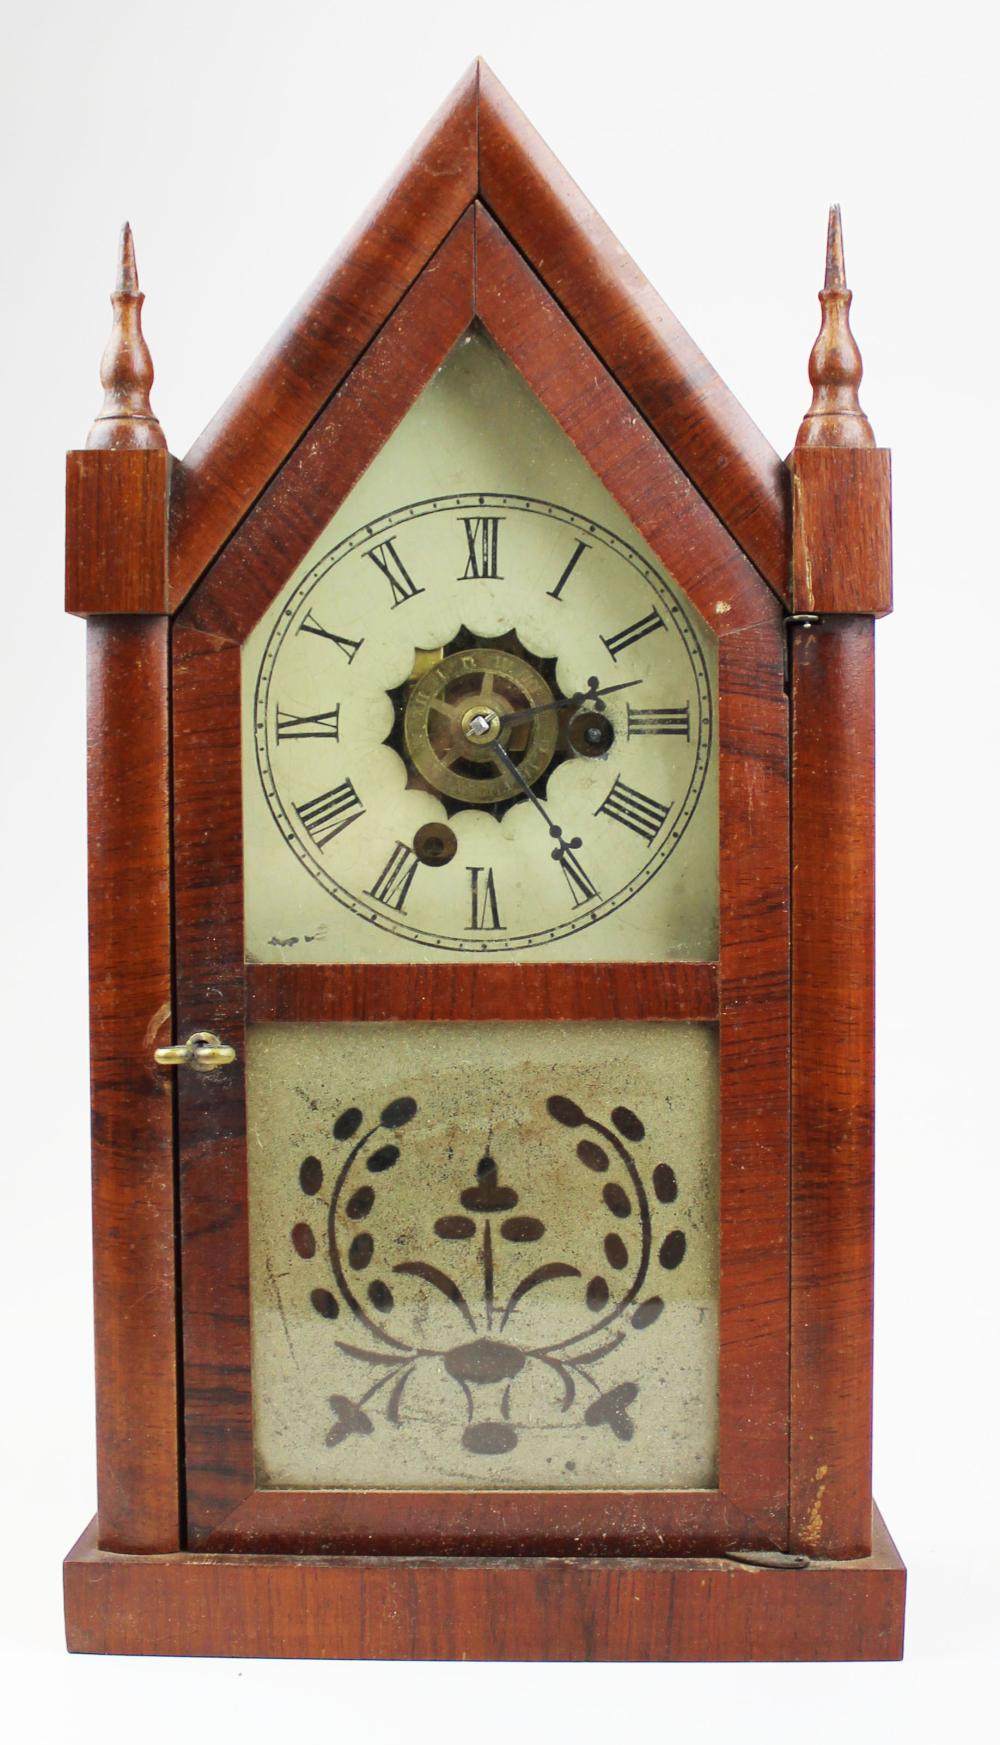 miniature E N Welch steeple clock